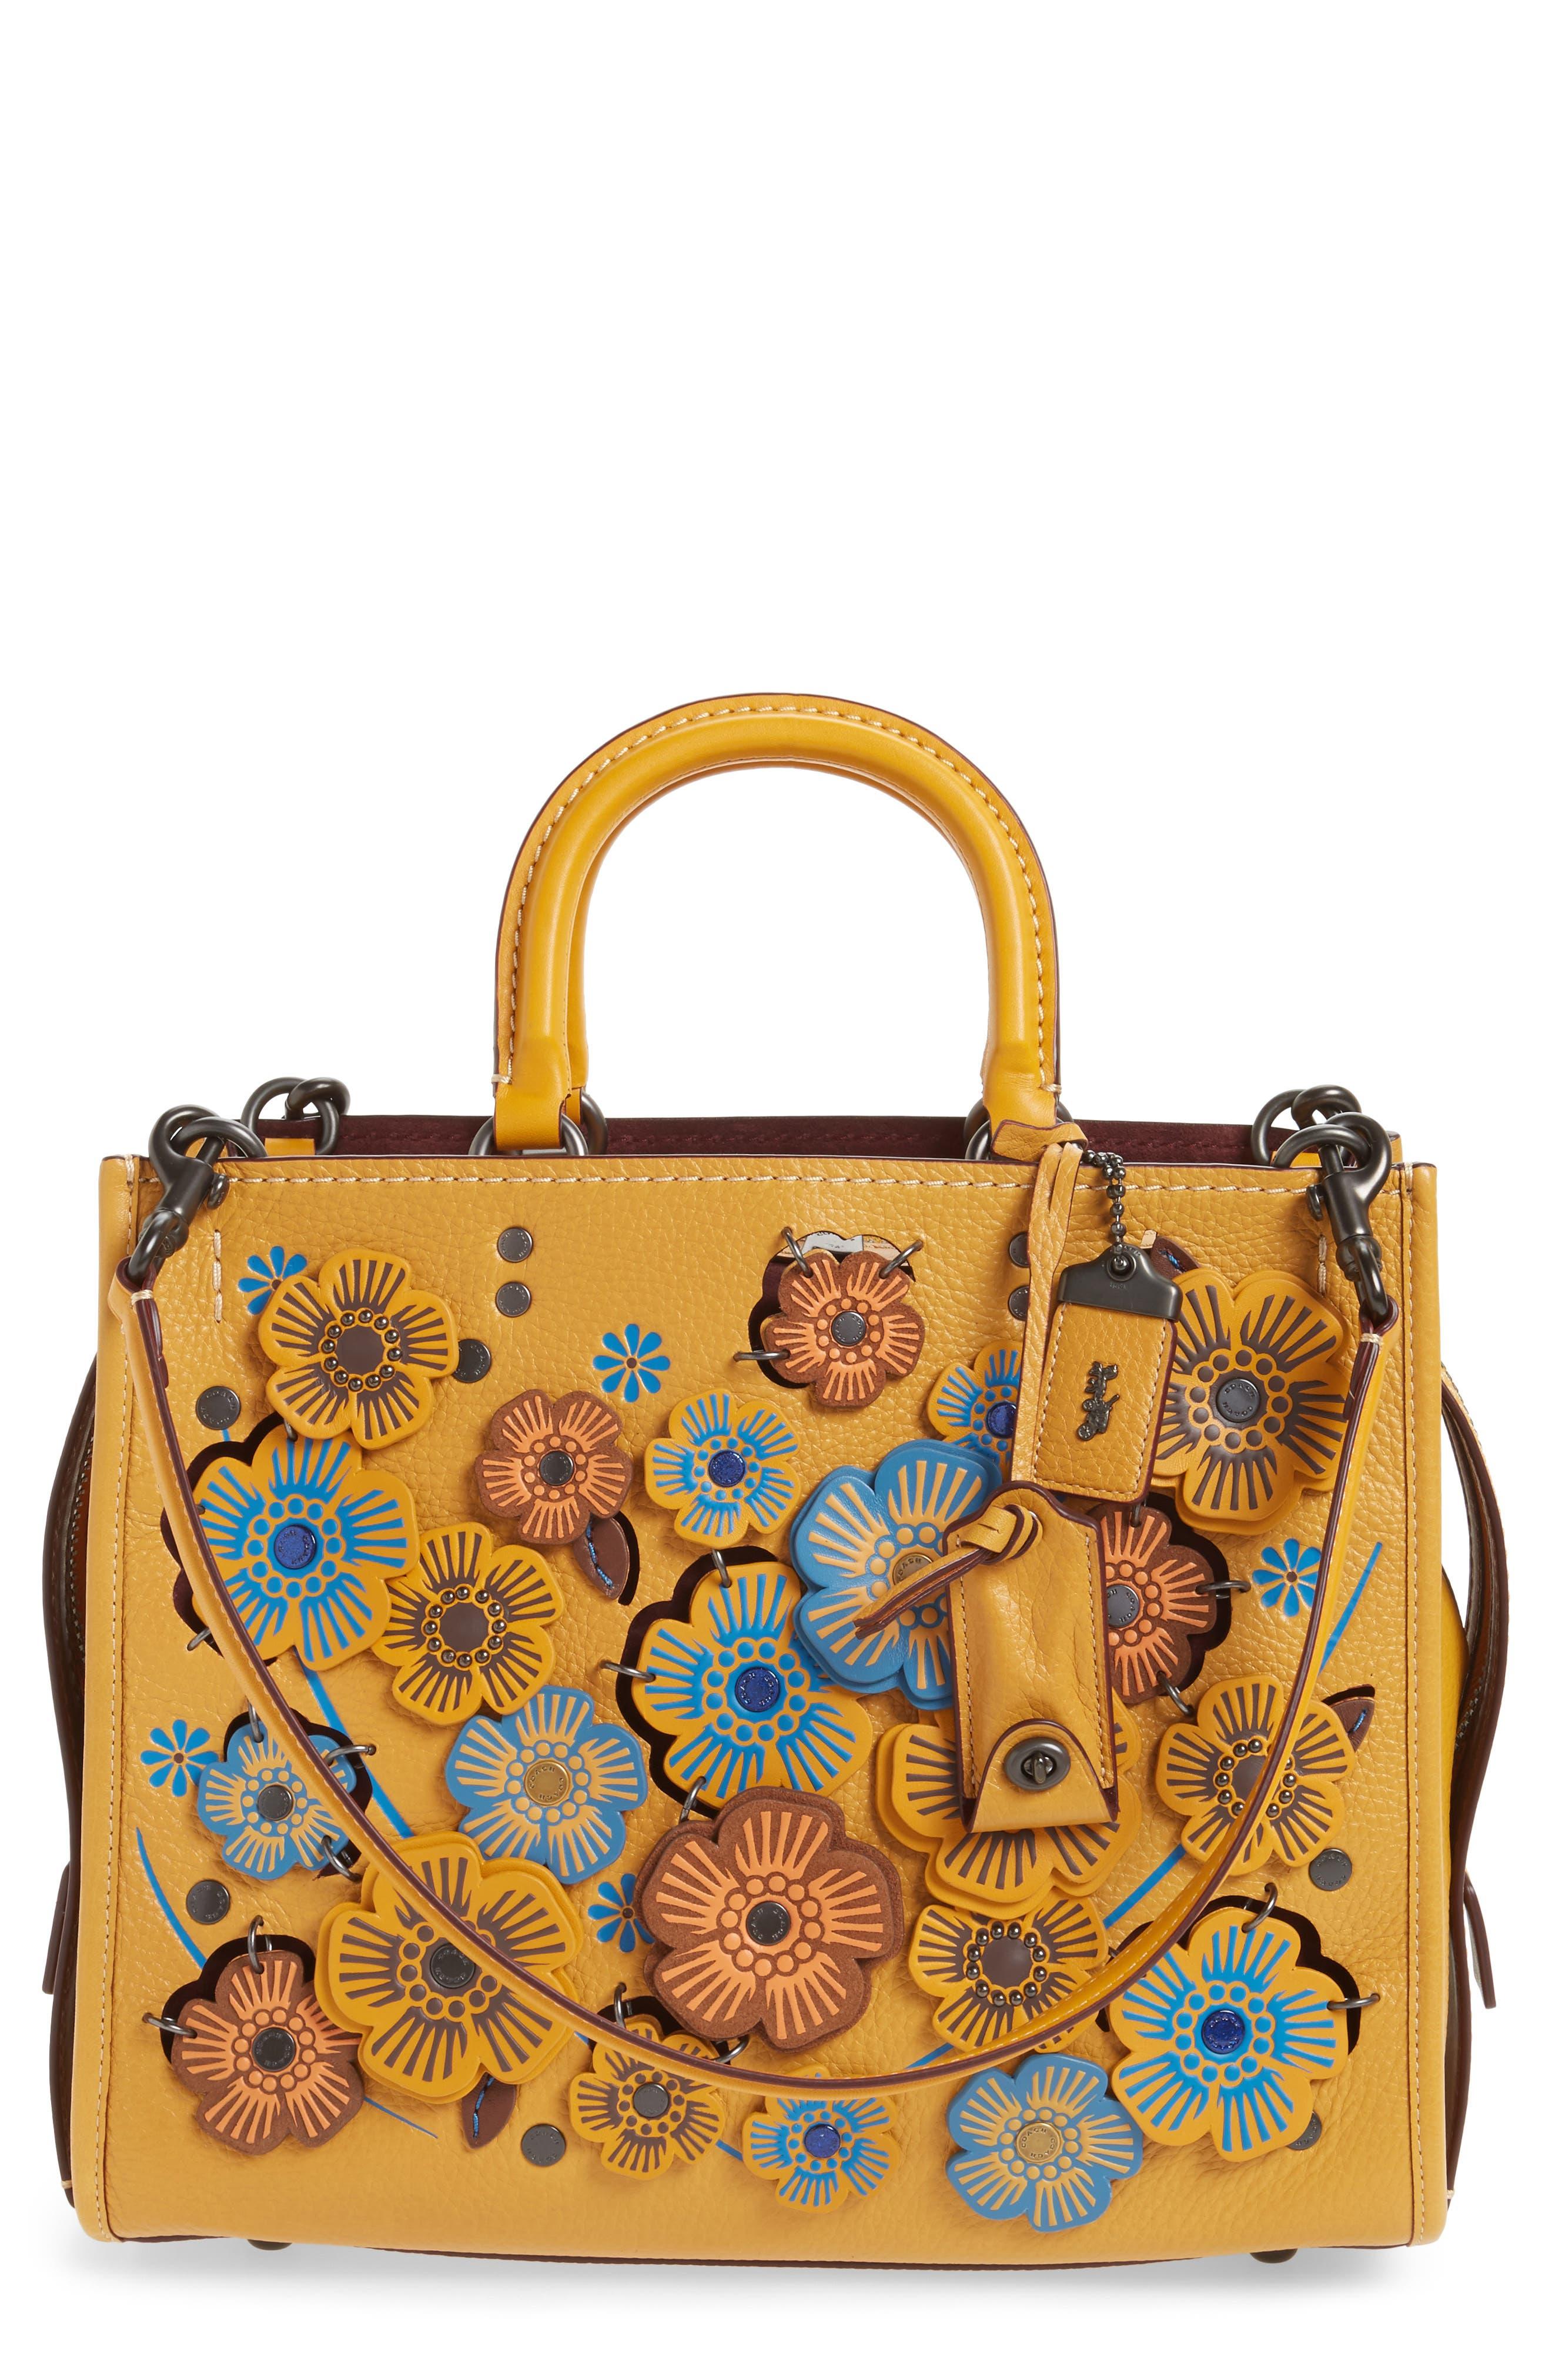 COACH 1941 Rogue Tea Rose Appliqué Leather Crossbody Bag